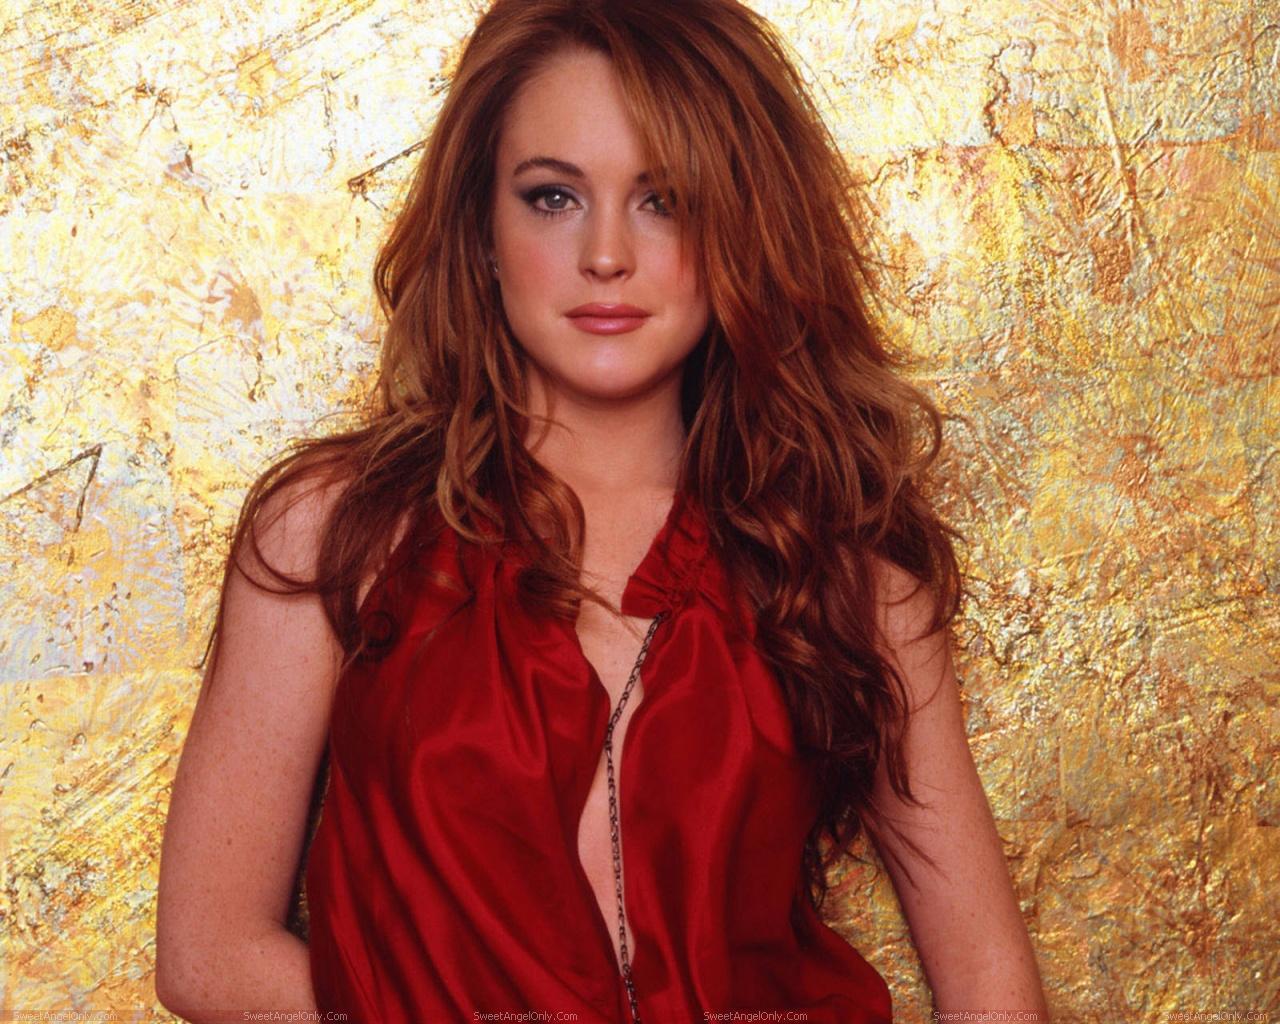 http://1.bp.blogspot.com/-xmdArn12aak/TYcCXqpdHPI/AAAAAAAAFv8/Cu0r85m6n2k/s1600/lindsay_lohan_hollywood_hot_actress_wallpaper_sweetangelonly_29.jpg